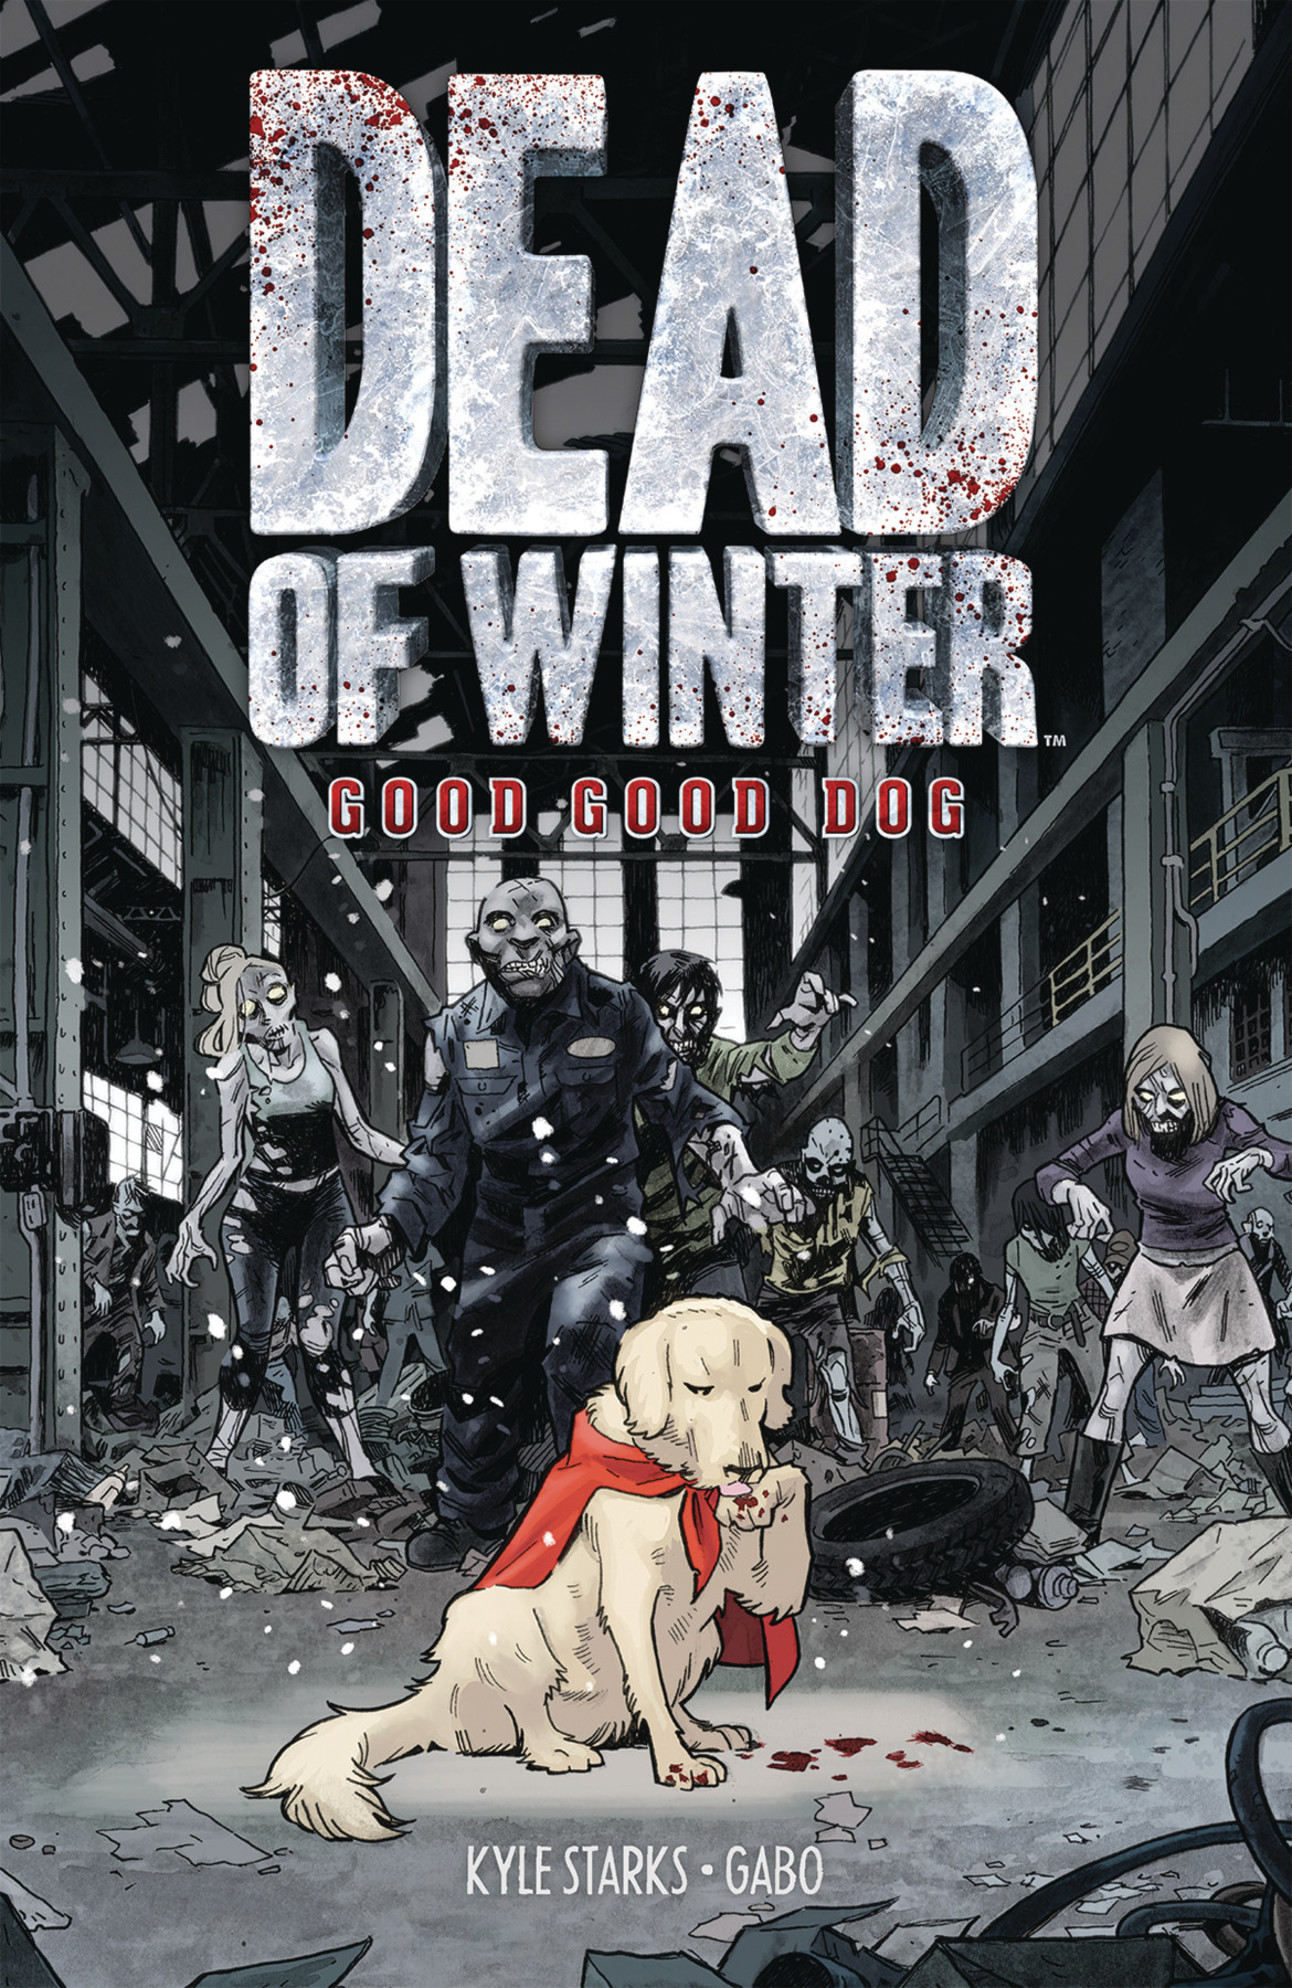 oni_dead_of_winter_good_good_dog_cover.jpg